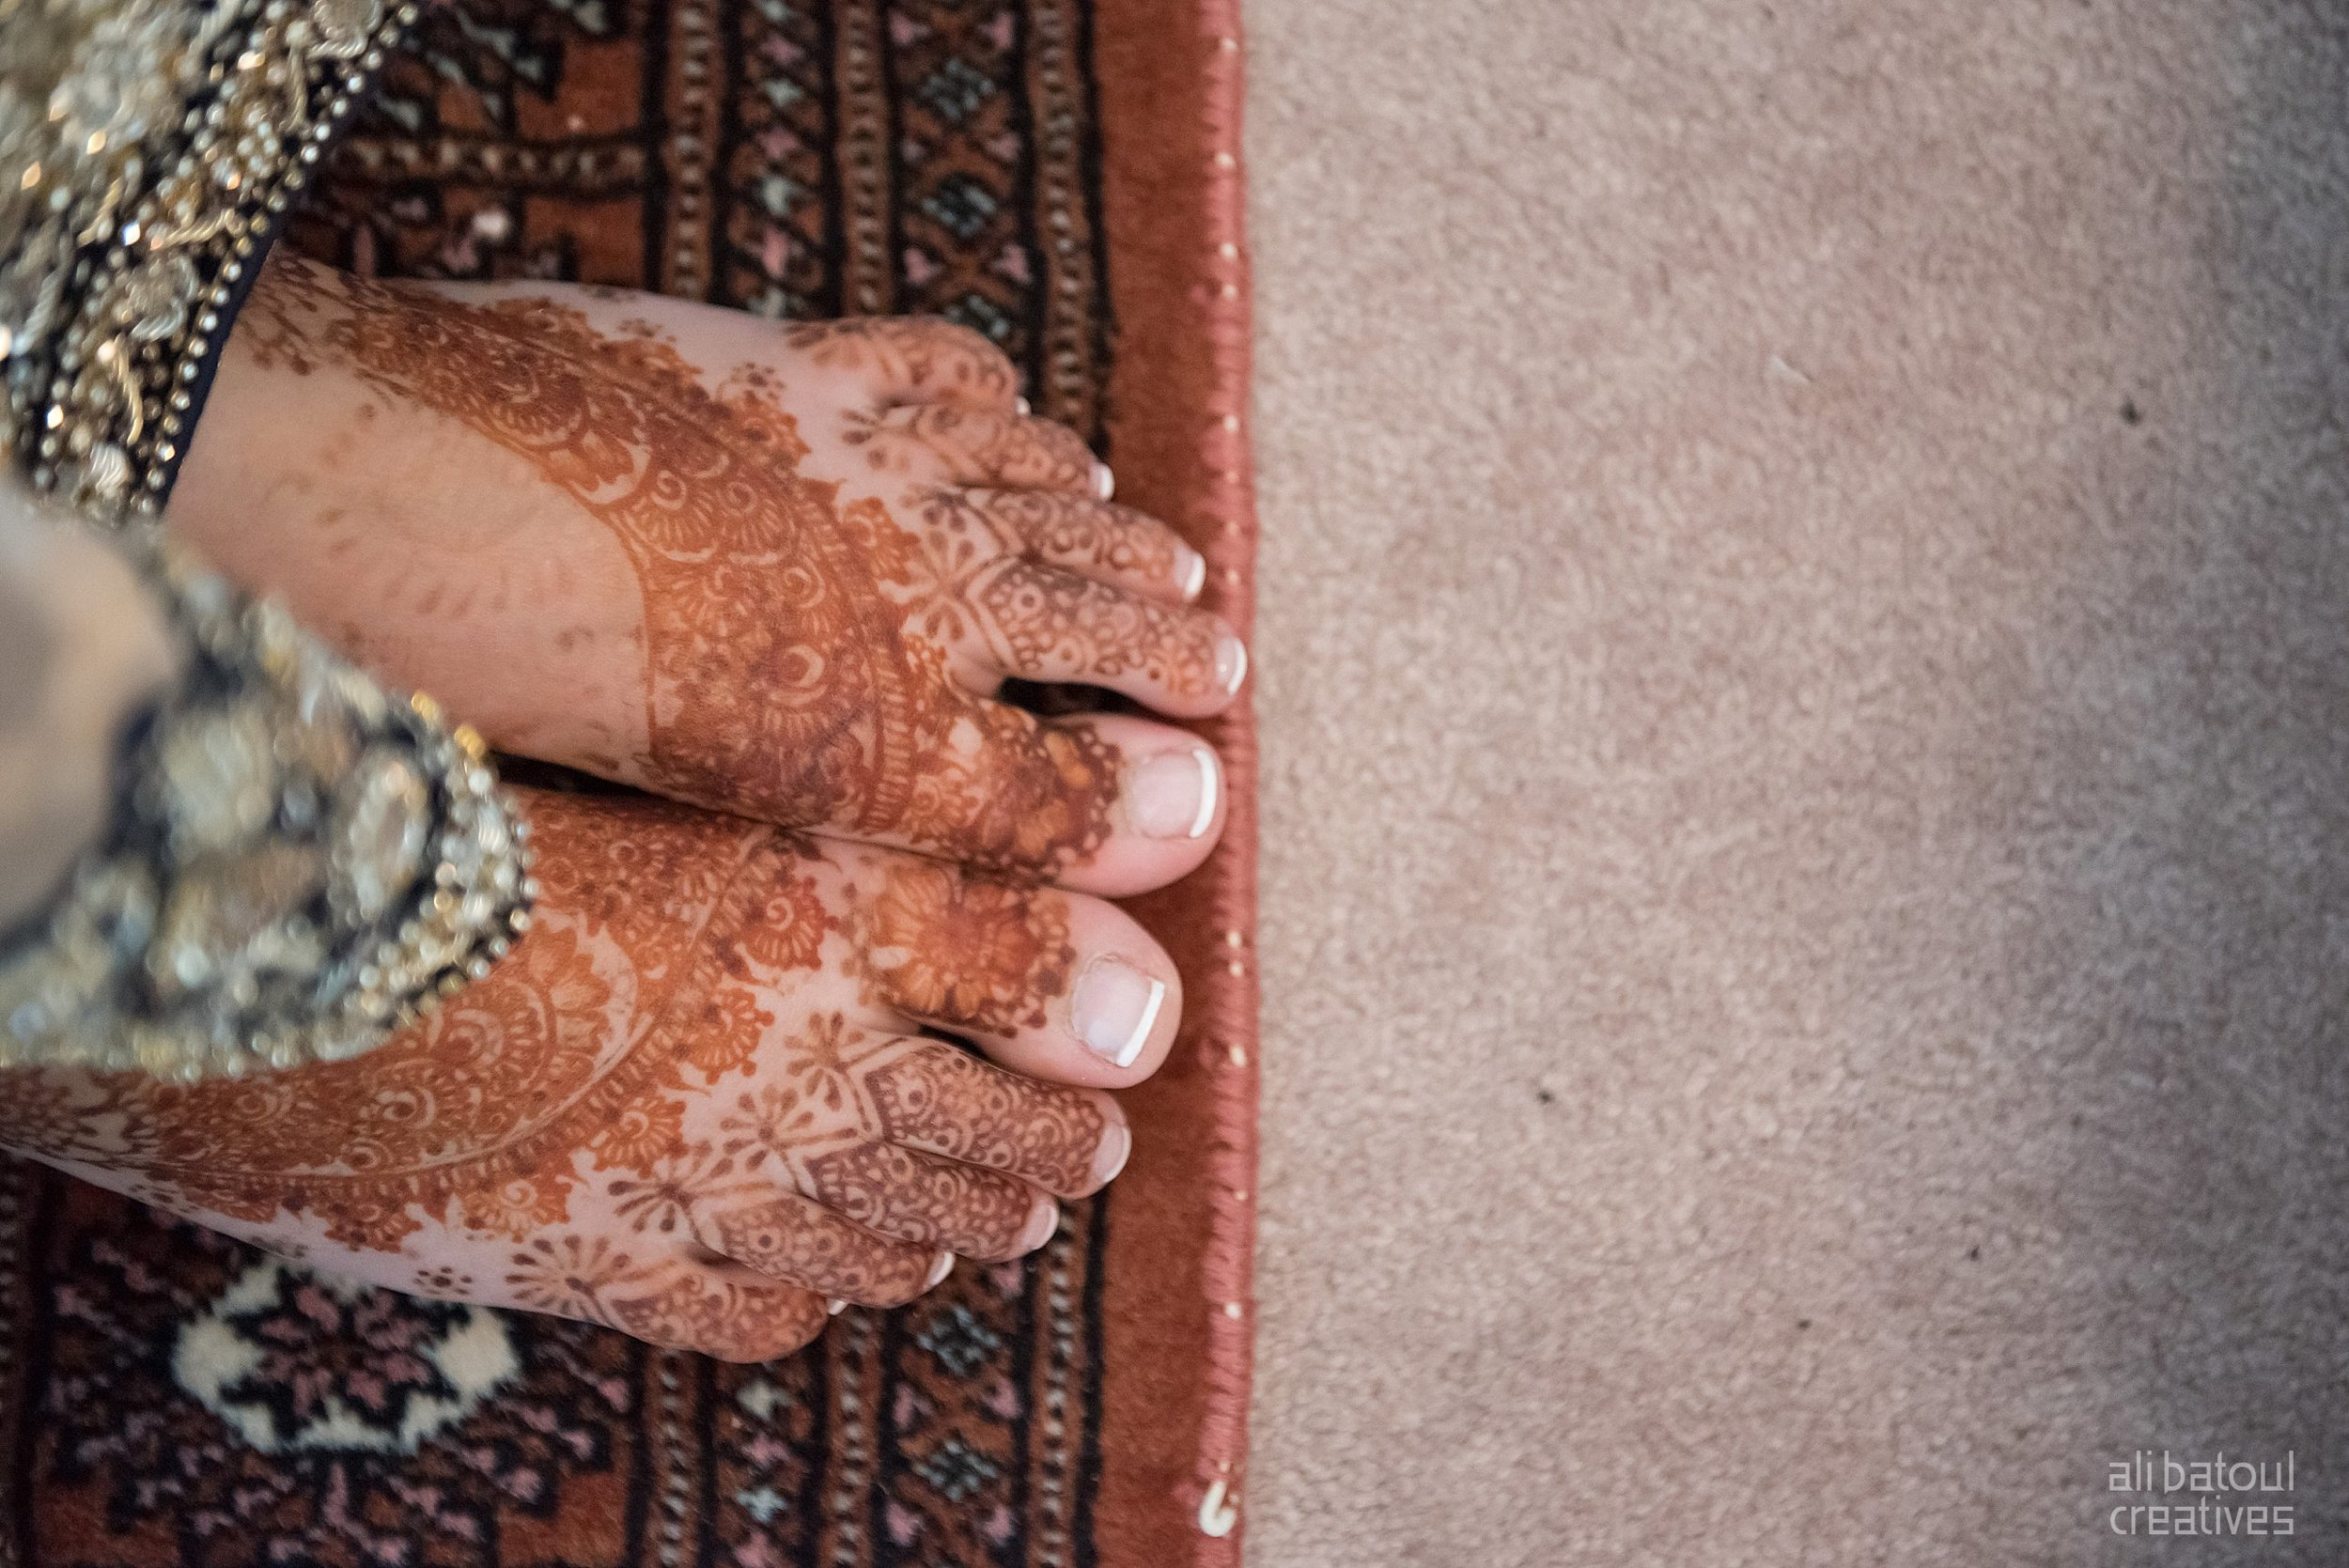 Alina + Mahmood - Ali Batoul Creatives Blog-12_Stomped.jpg